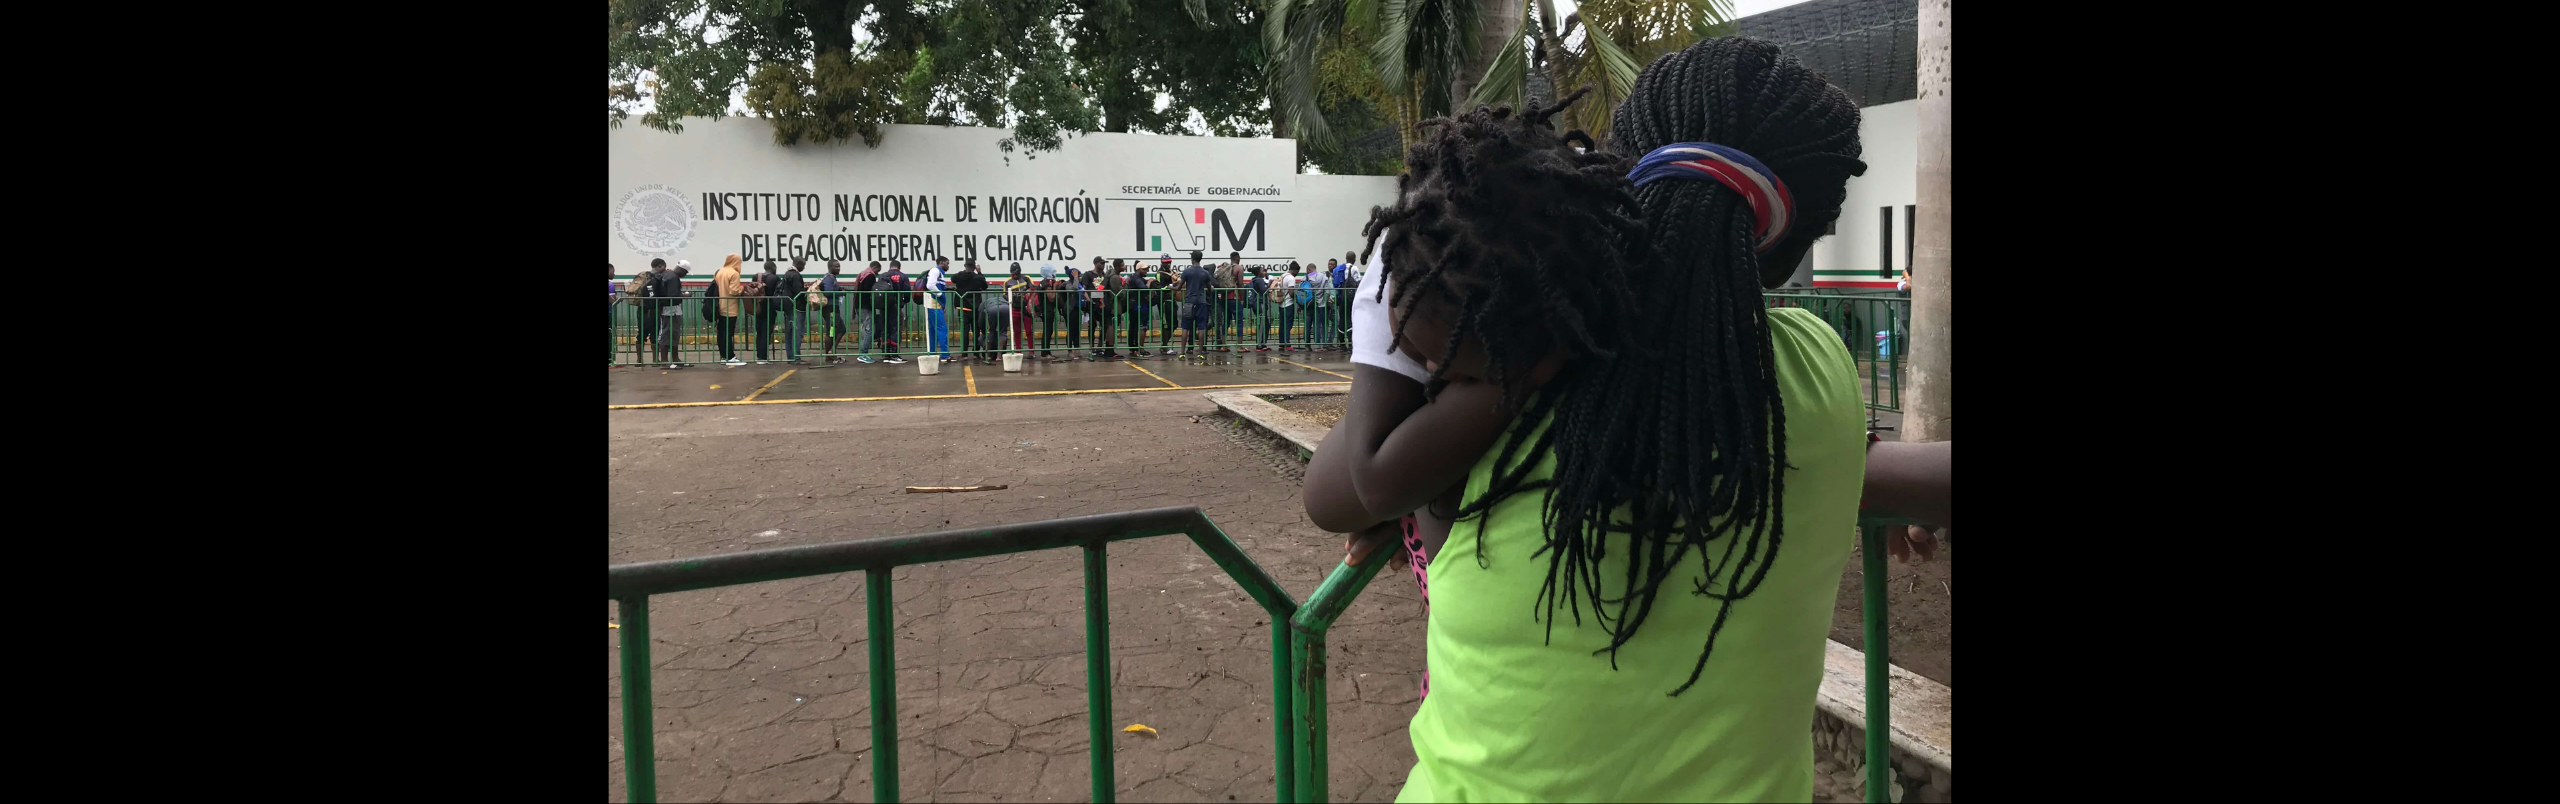 HAITI MIGRACION